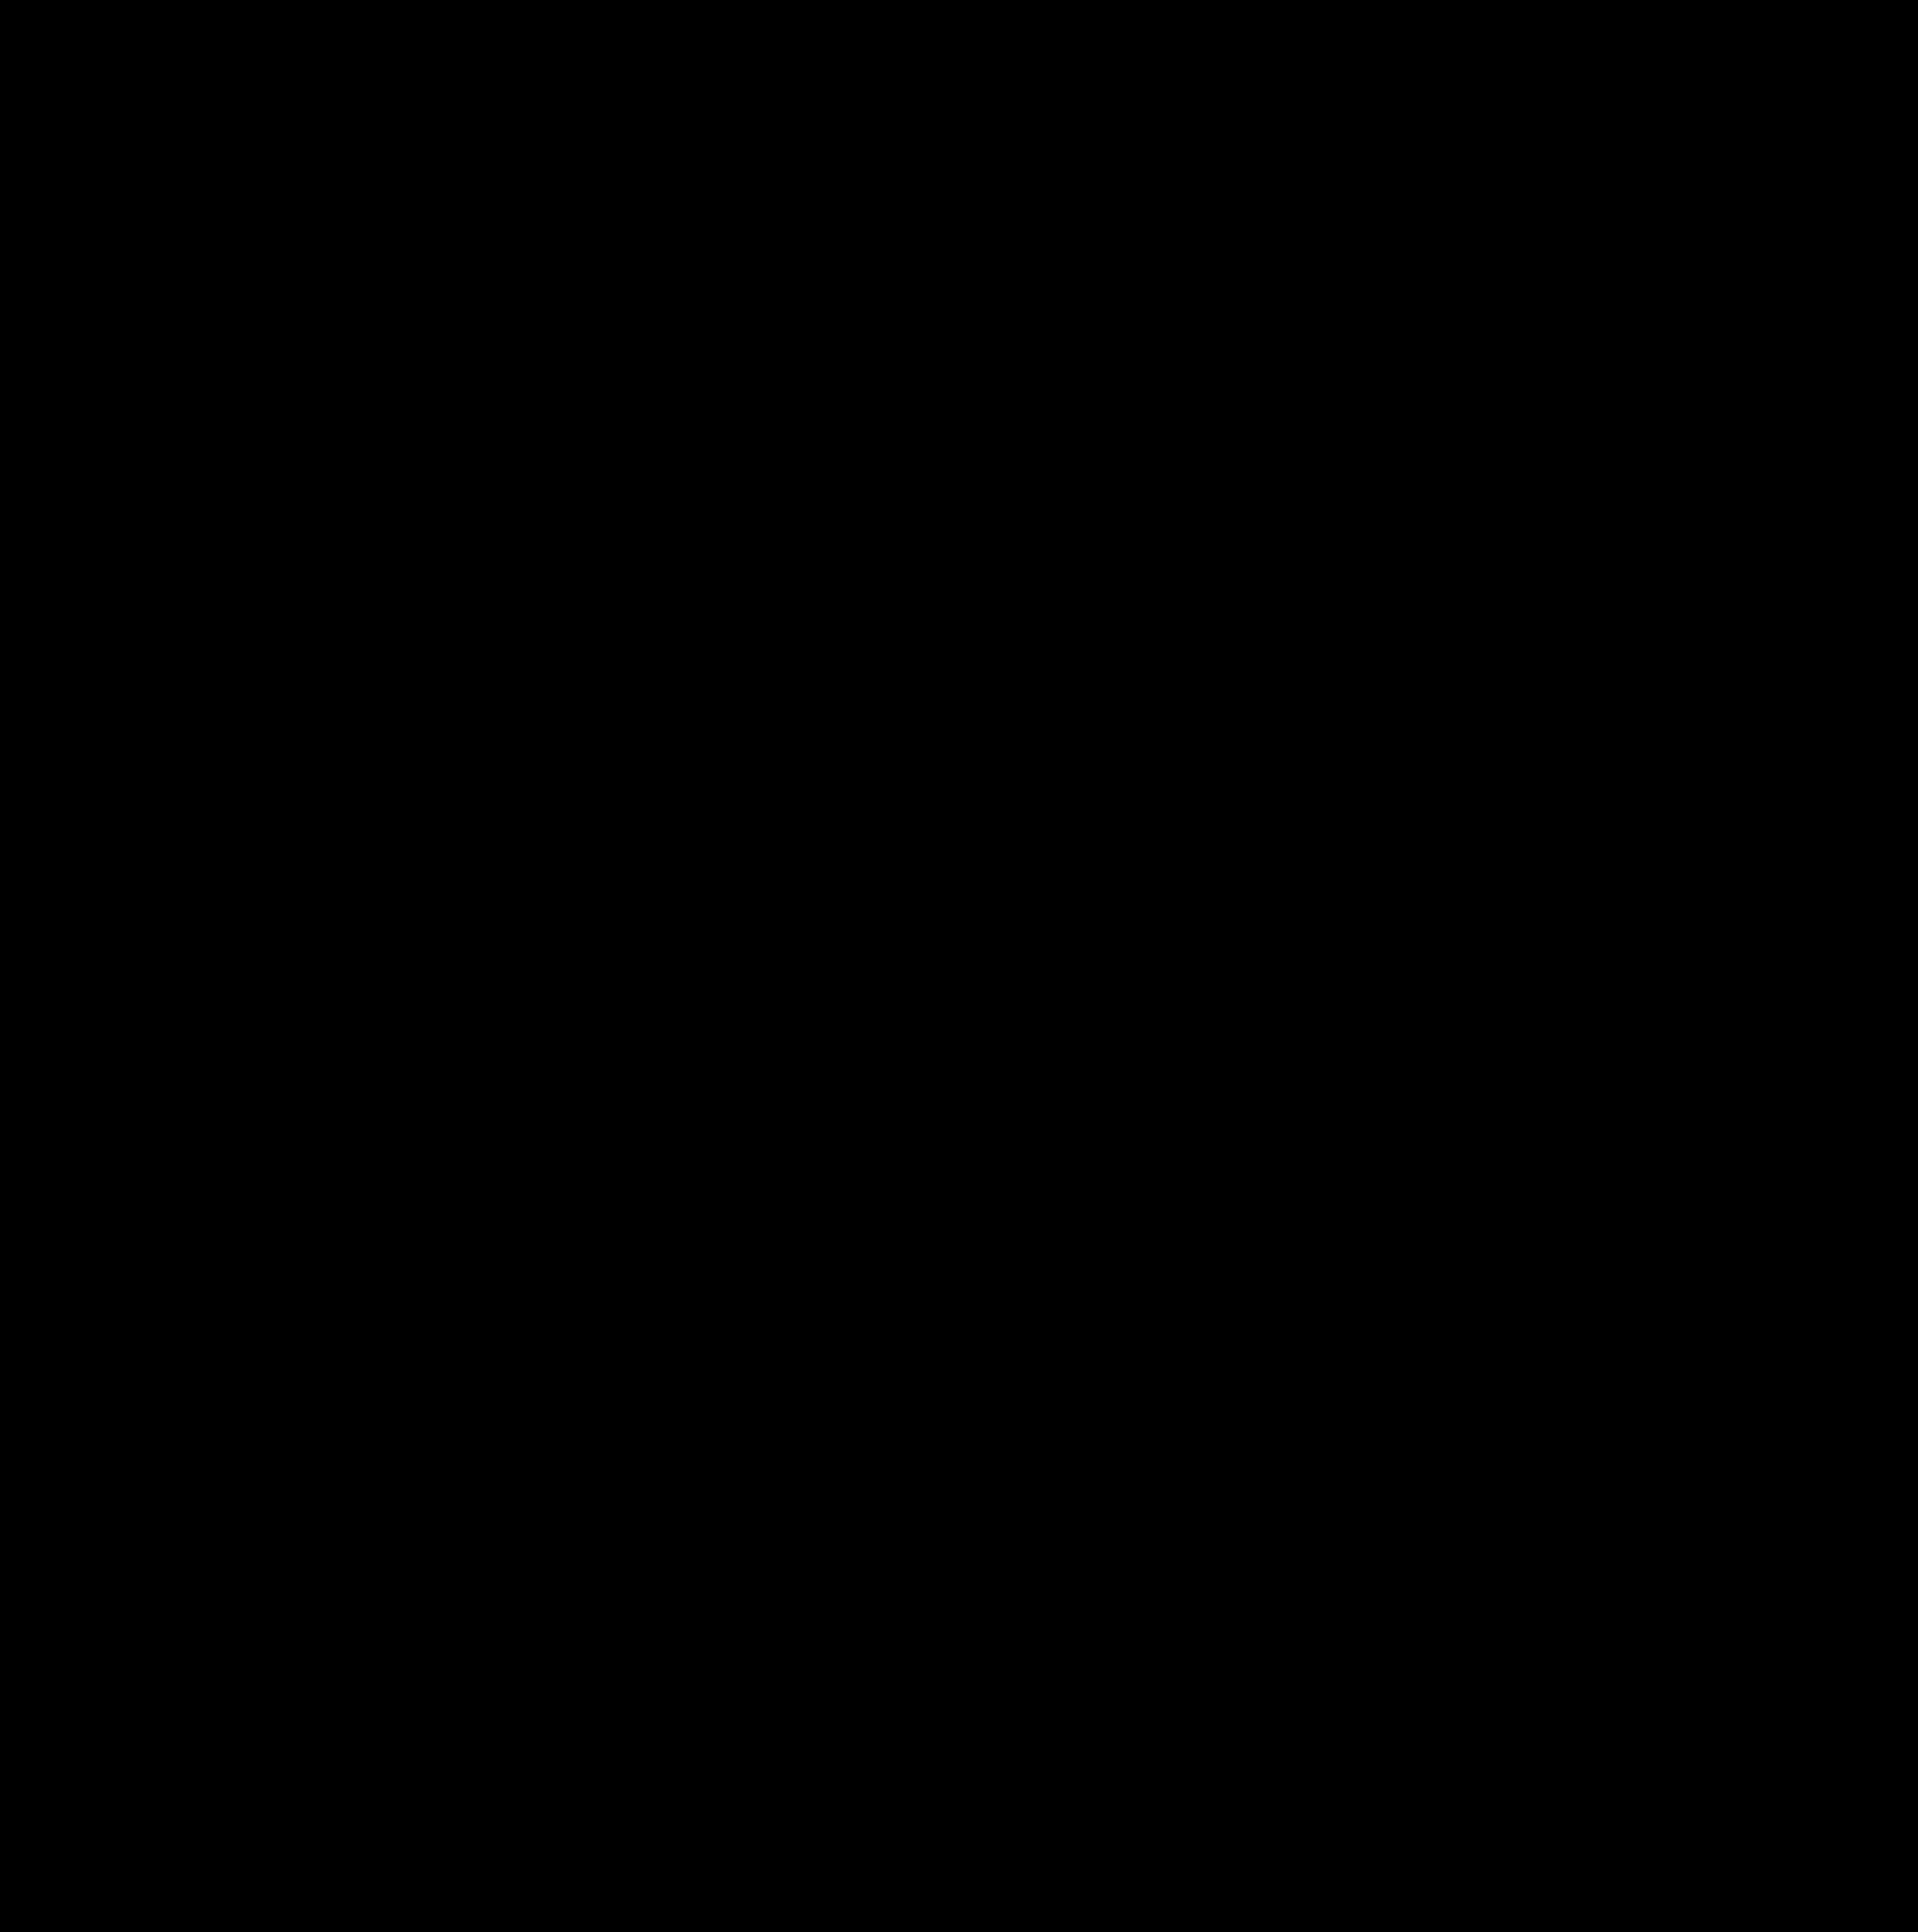 Clipart heart border